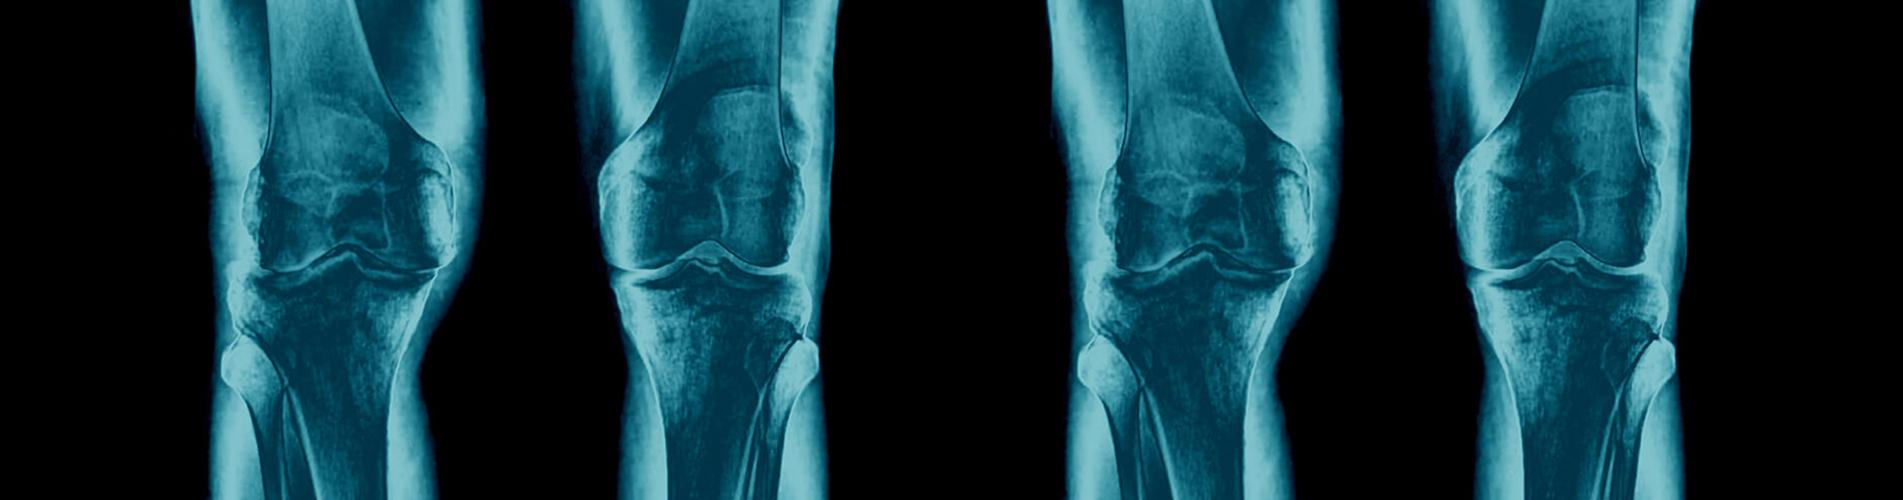 Approfondimento artrosi